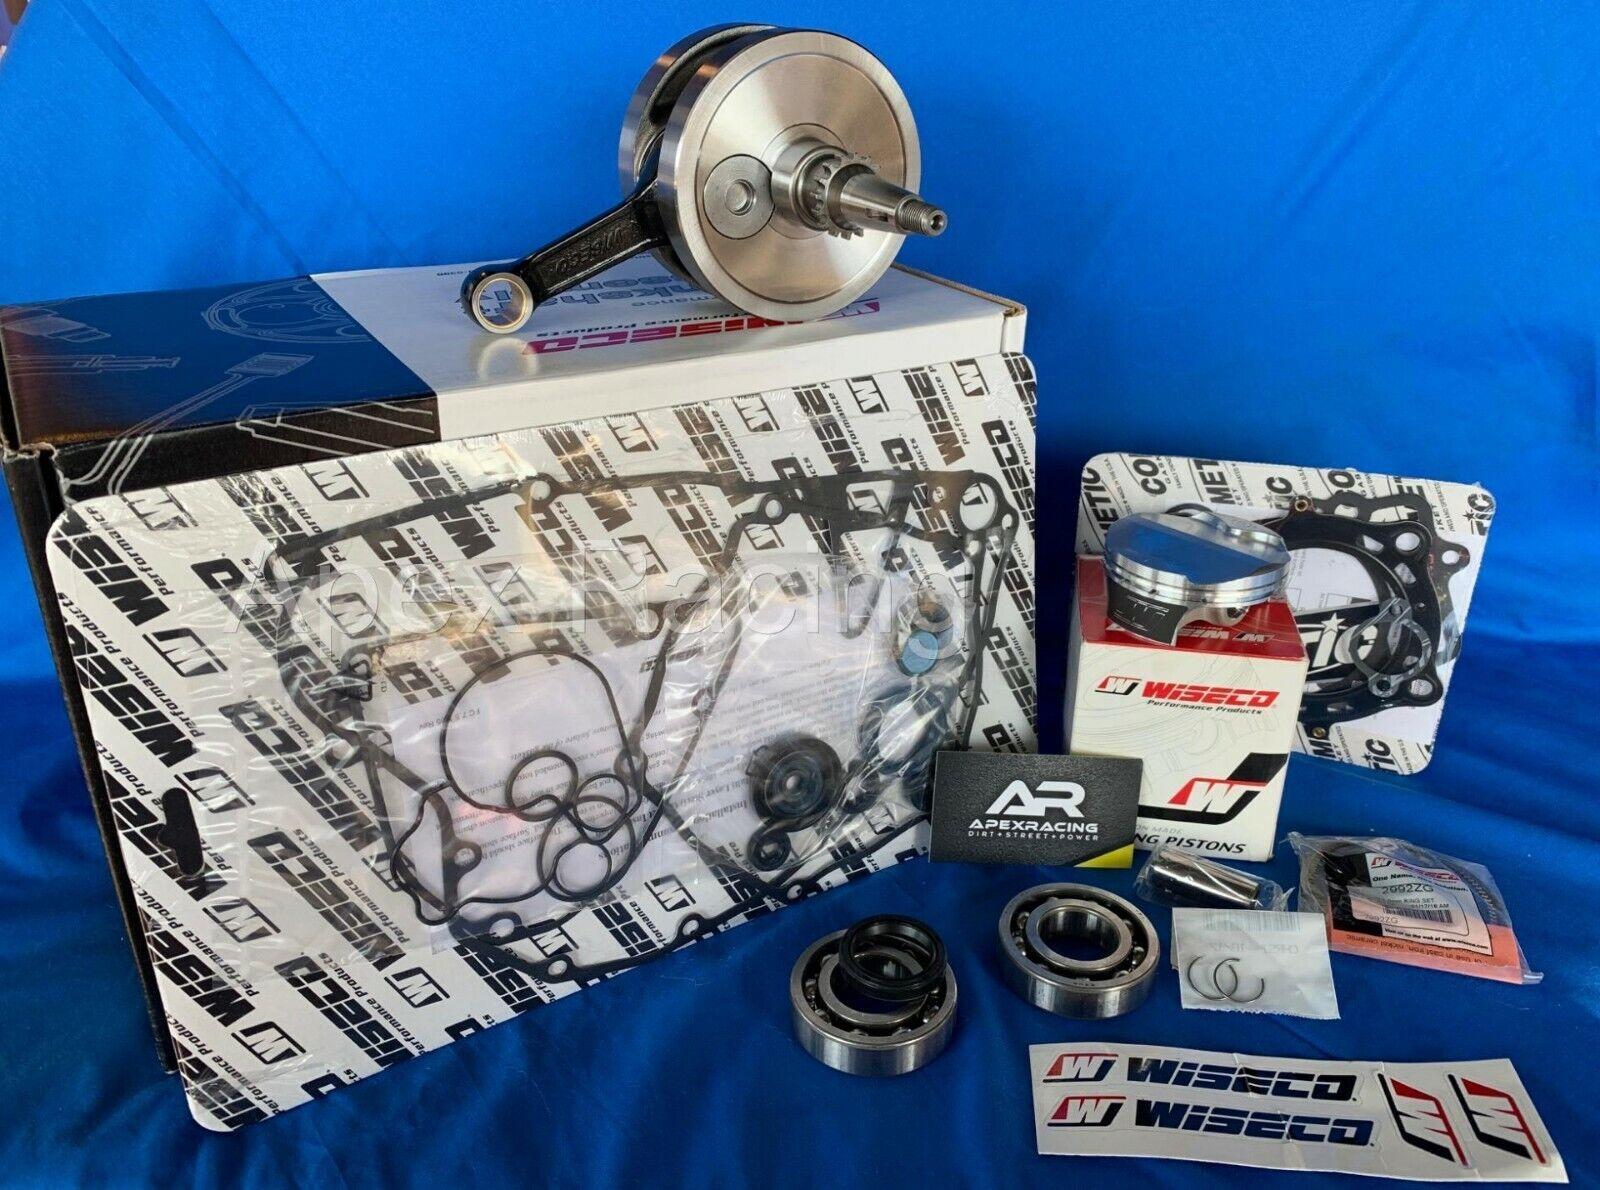 Wiseco Bottom End Rebuild Kit for Kawasaki KX250F 2009